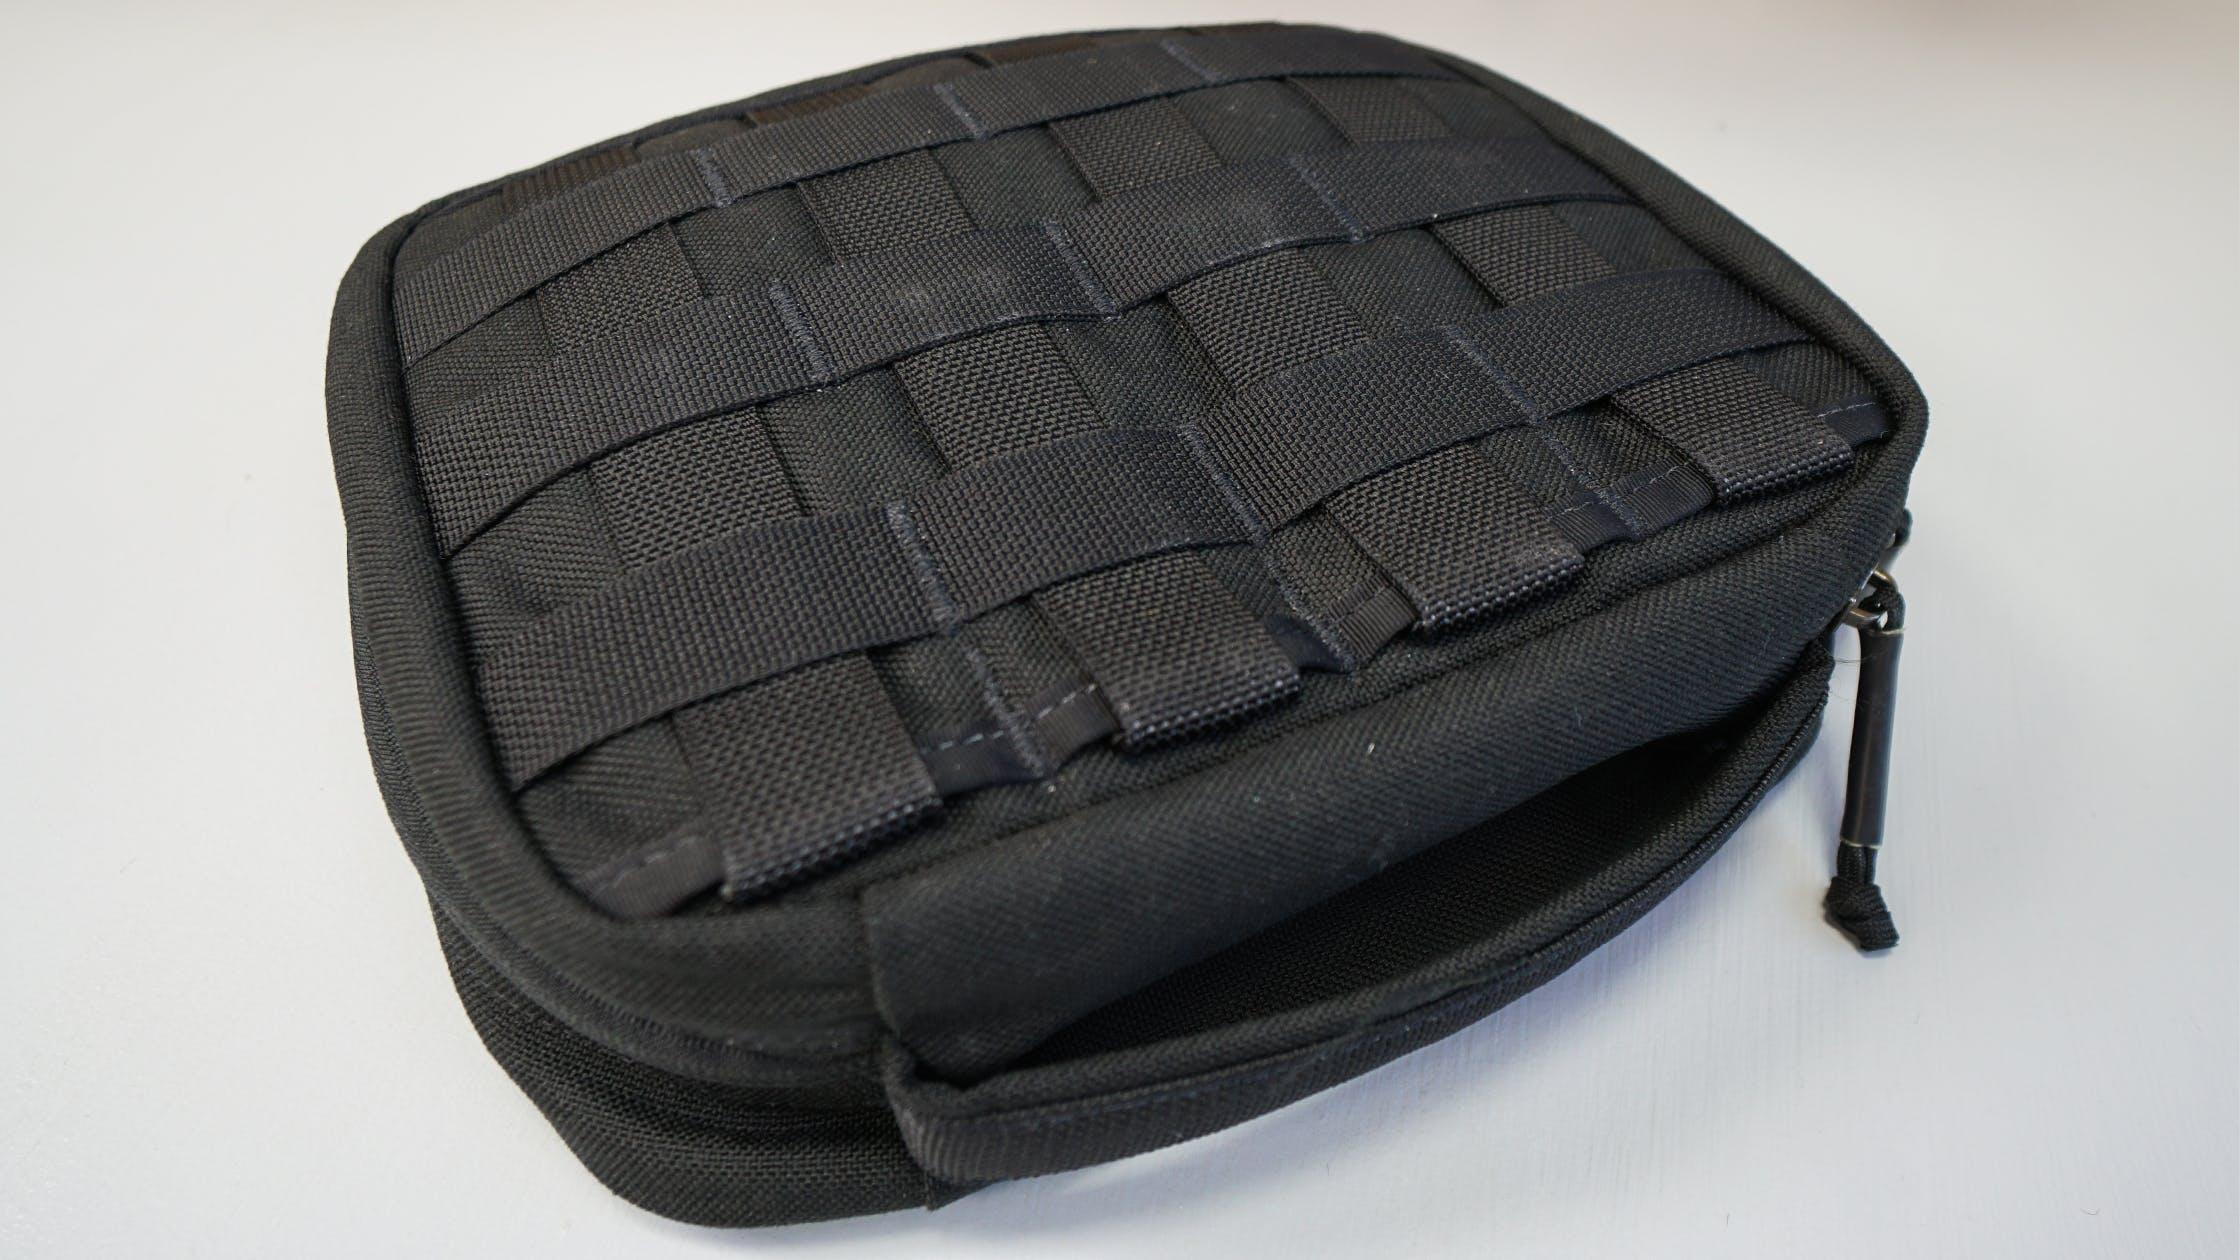 GORUCK GR2 Padded Field Pocket PALS Attachment System